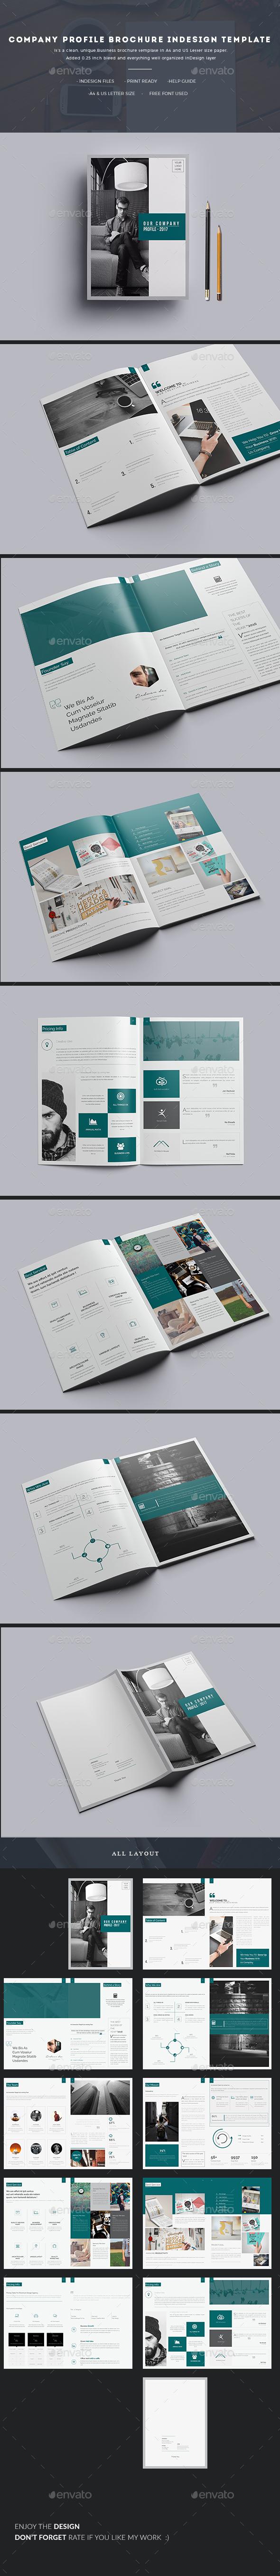 Company Profile Brochure InDesign Template - Corporate Brochures